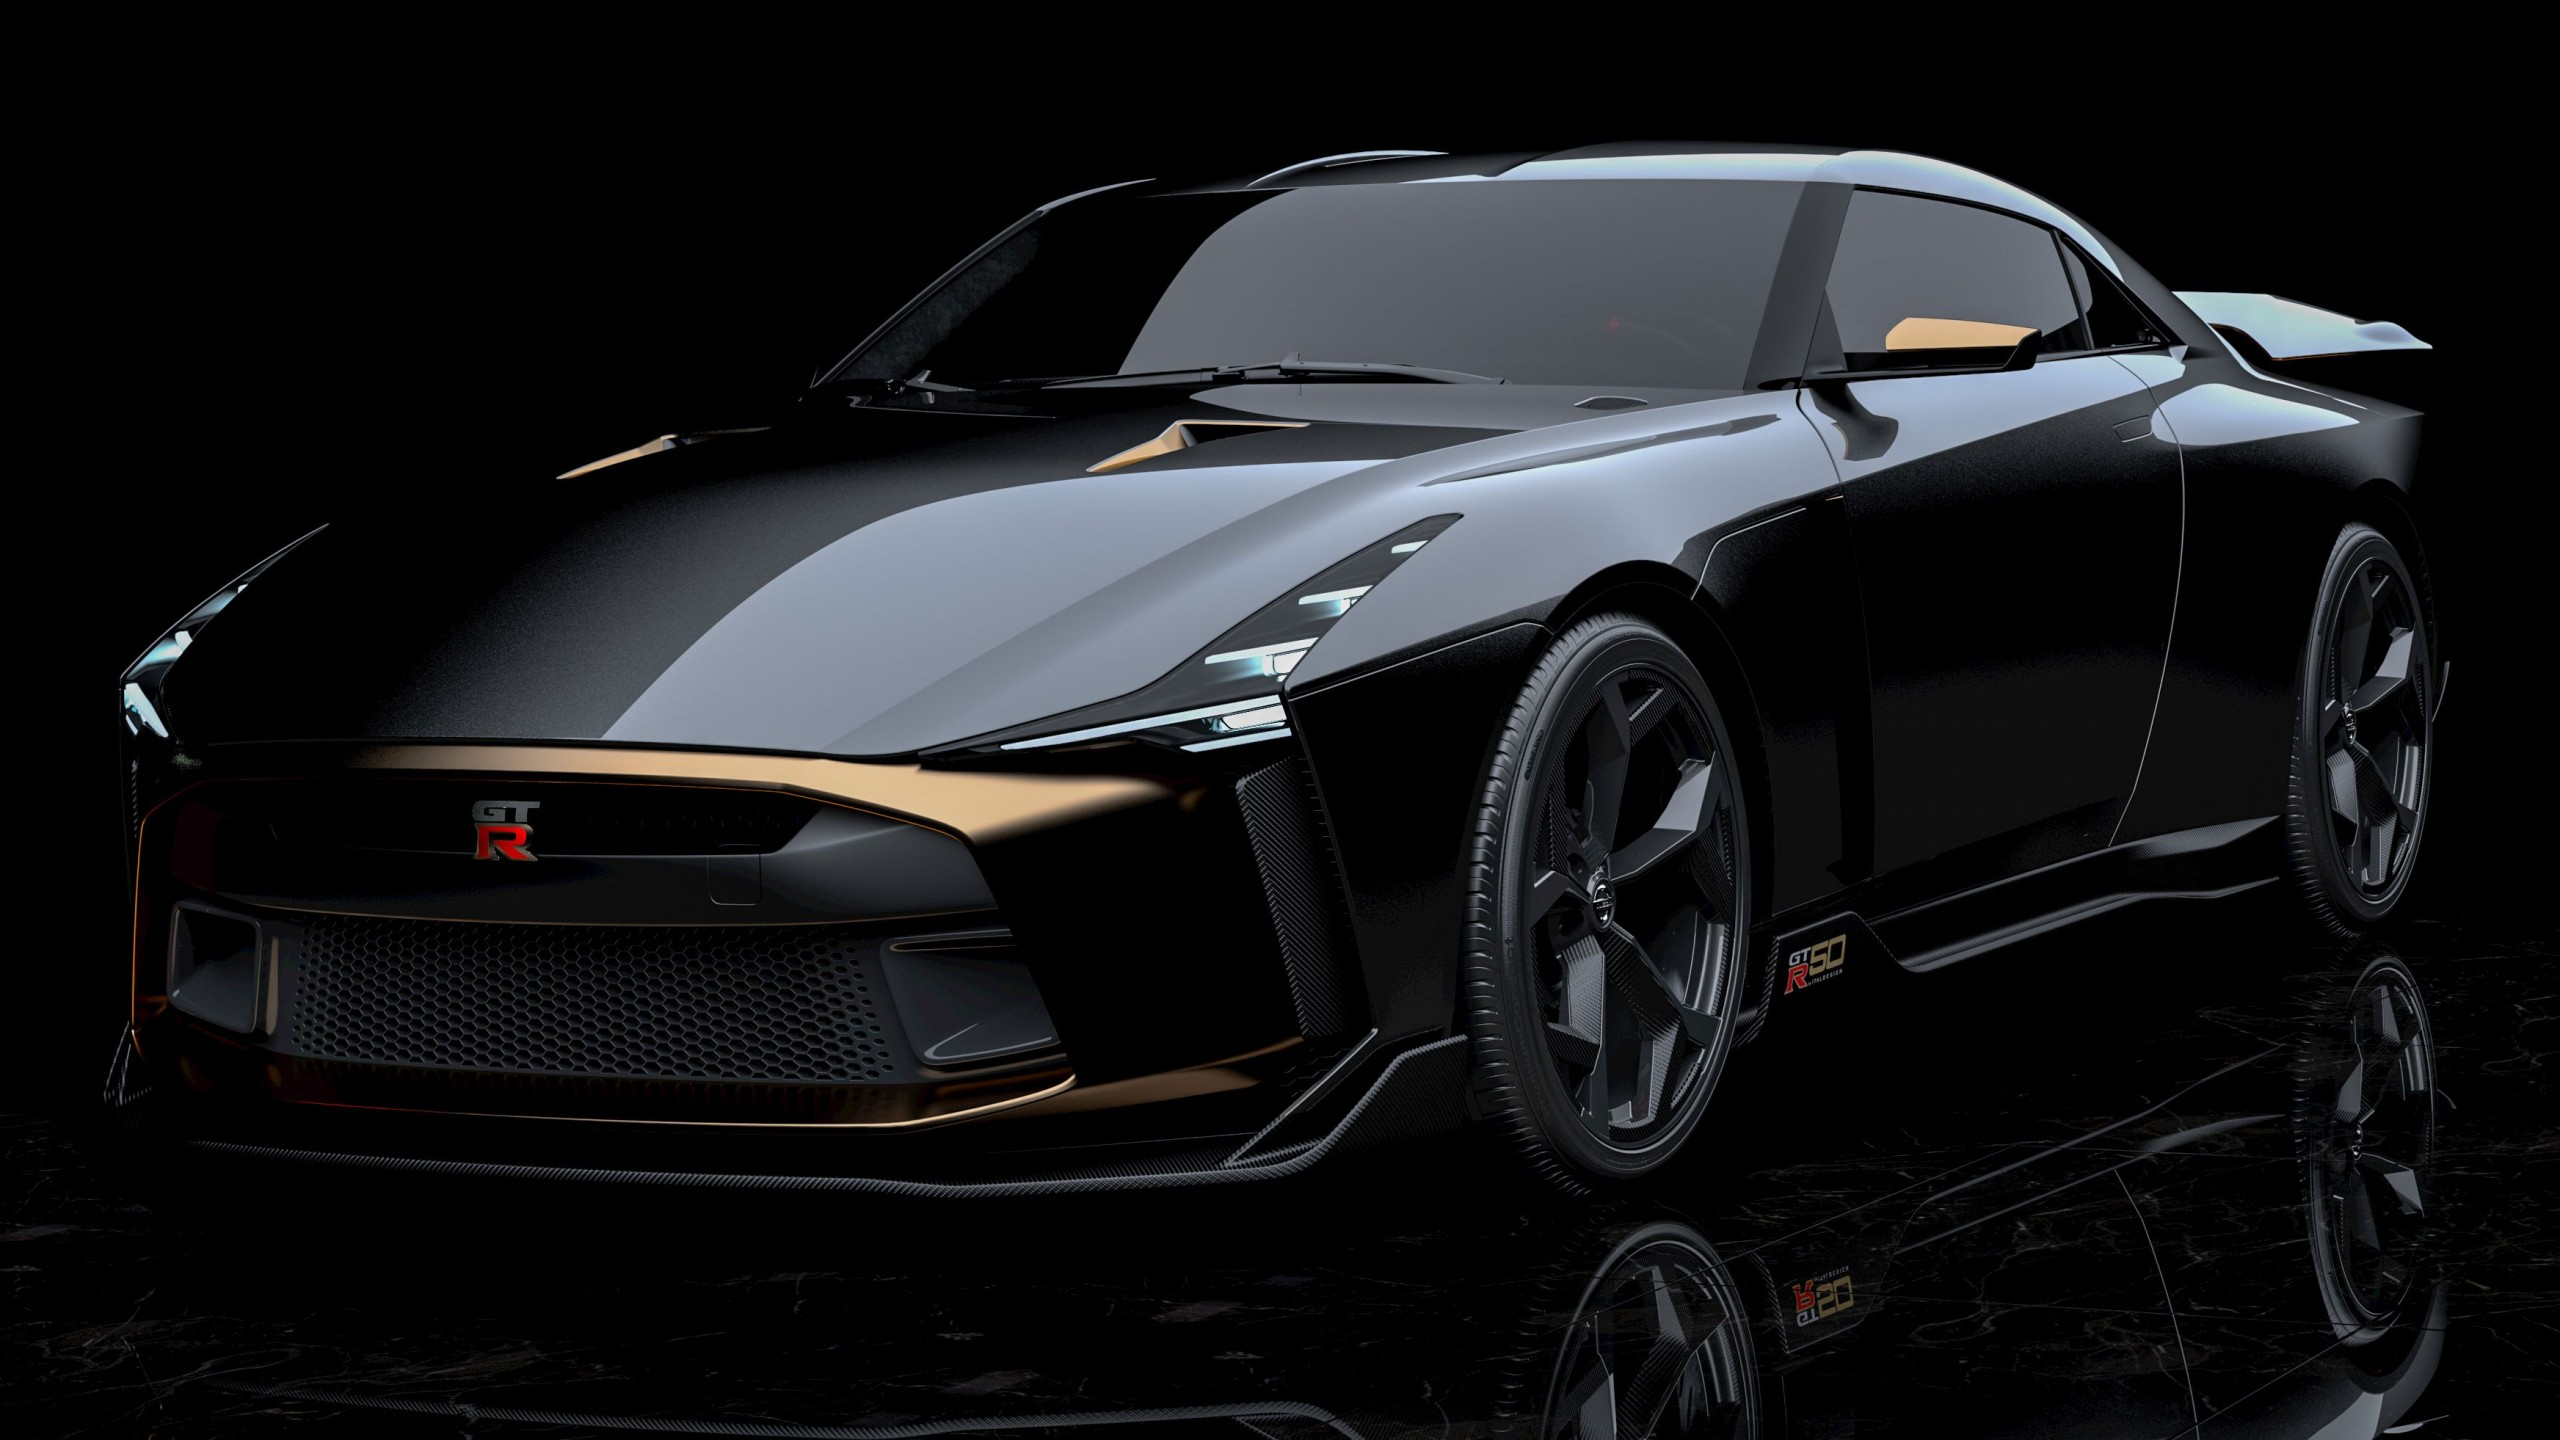 Wallpaper Nissan Gt R50 Italdesign Concept 2018 Cars 4k